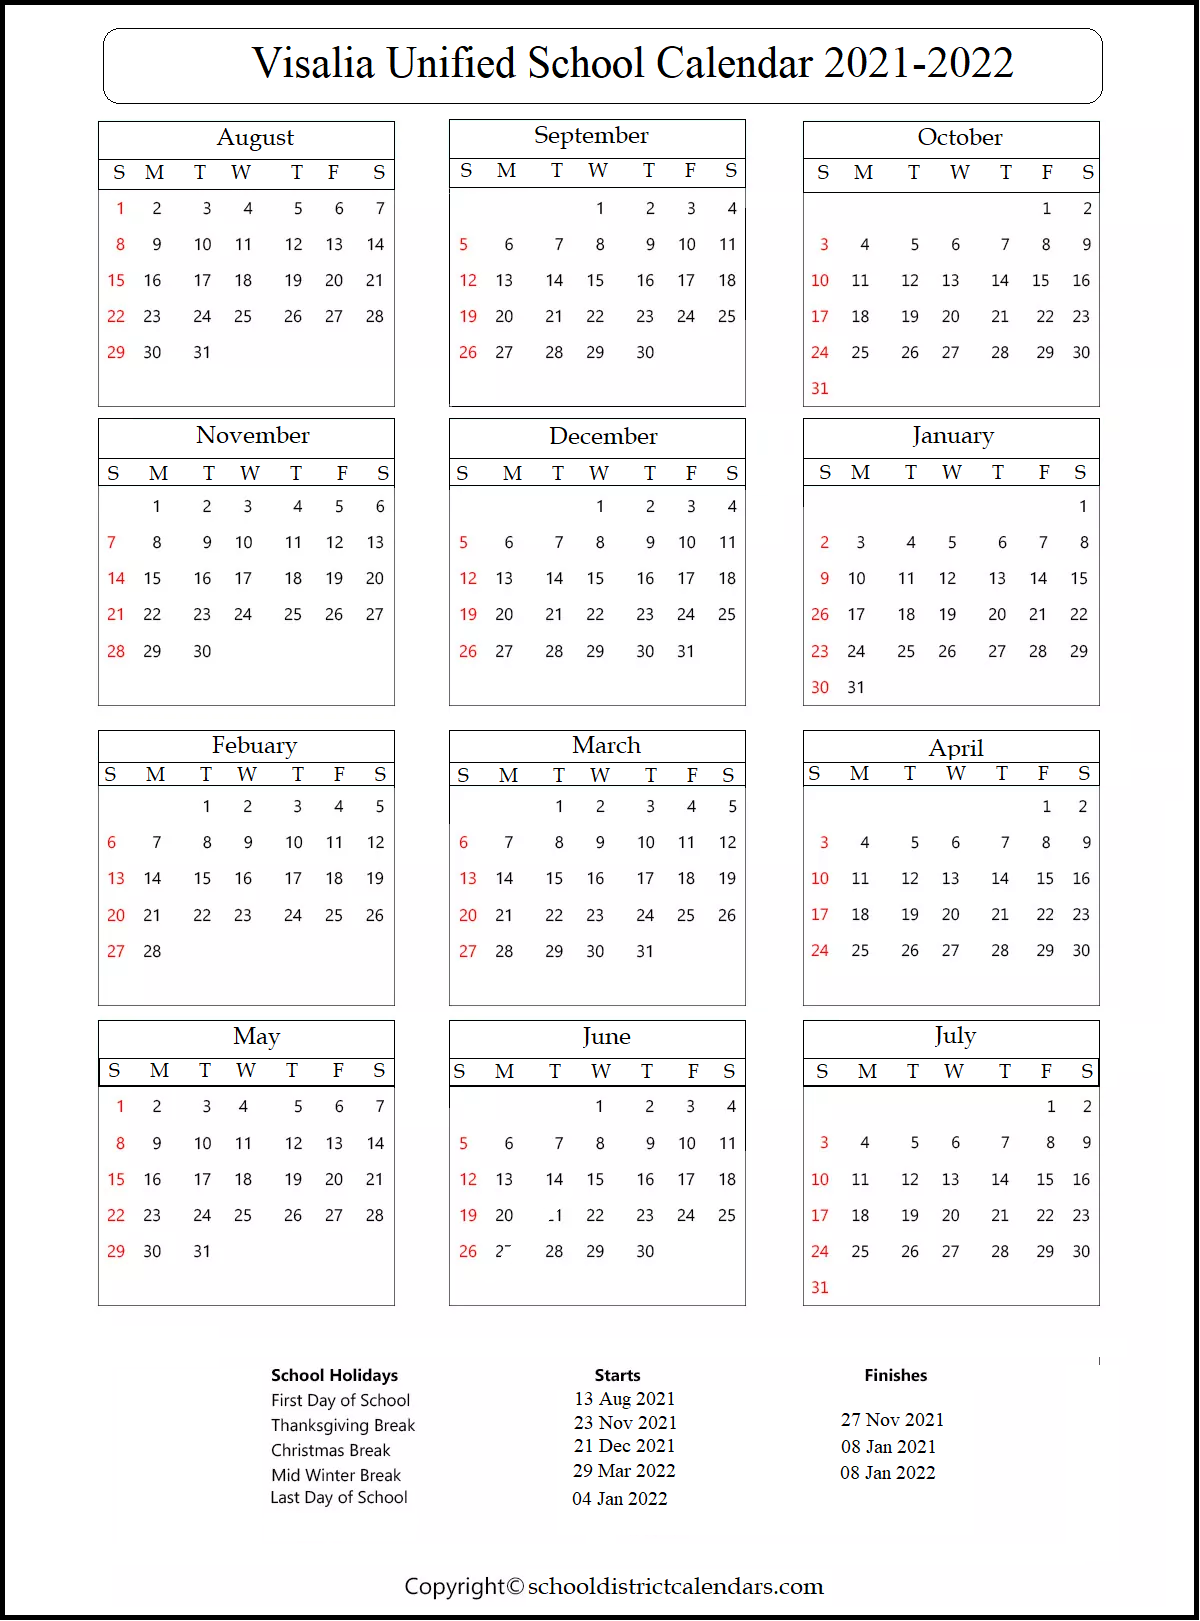 Visalia Unified School District Calendar 2021-2022,Visalia Unified School District Calendar